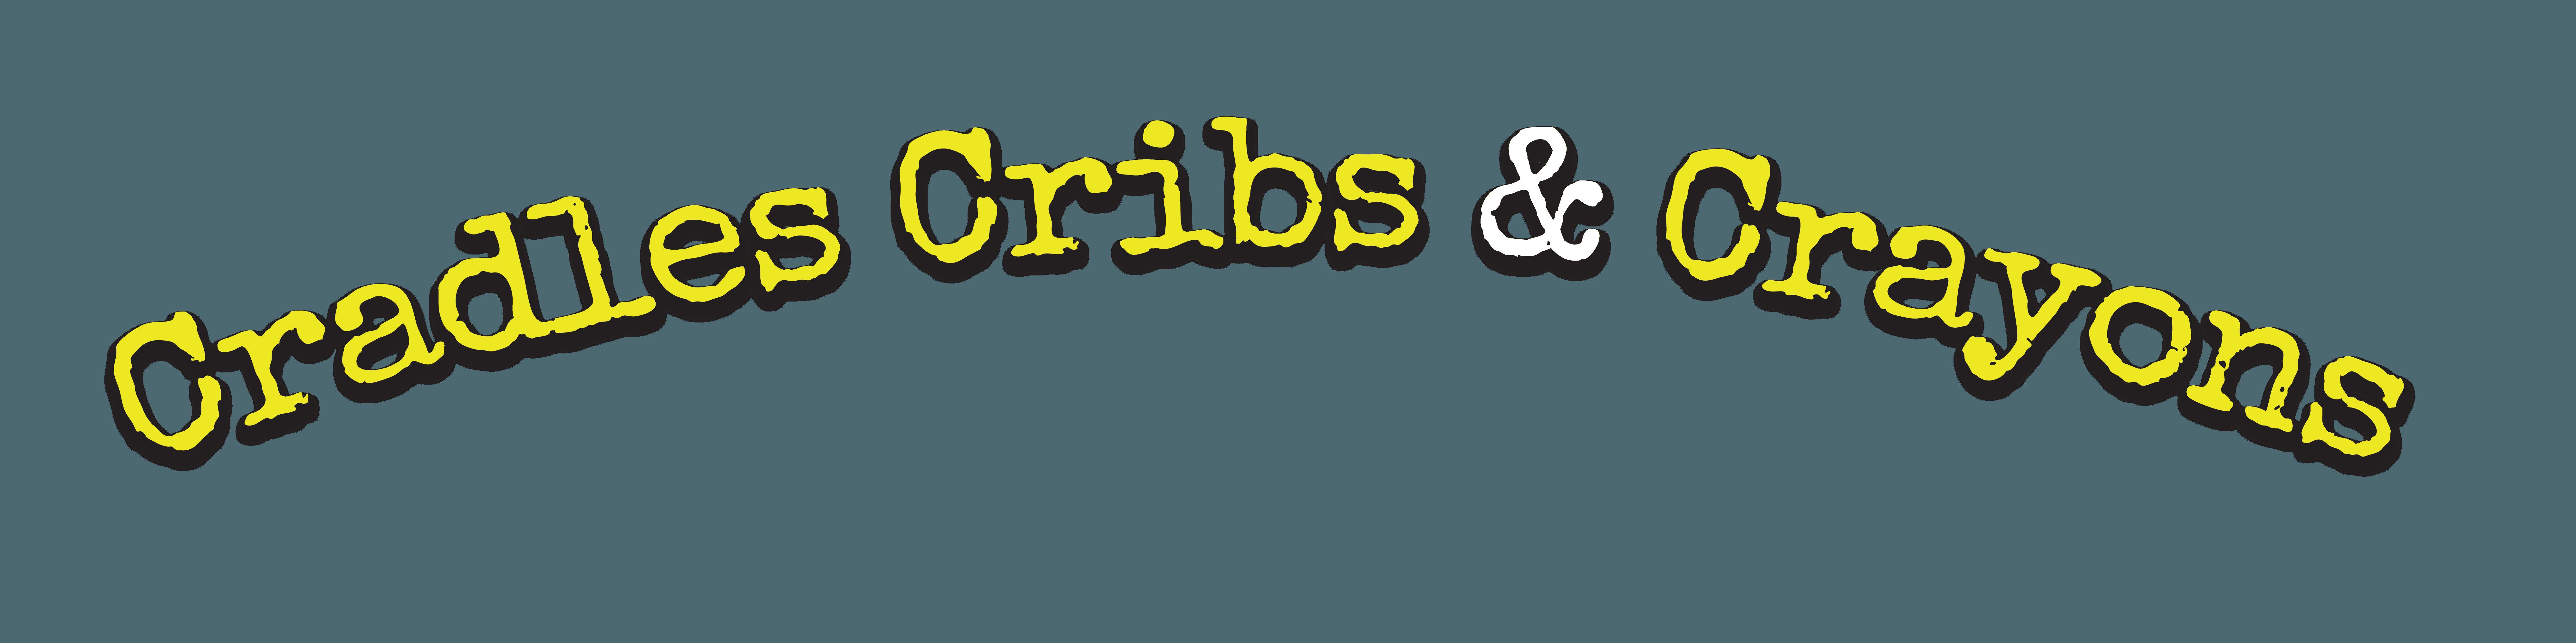 Cradles Cribs & Crayons - Logo